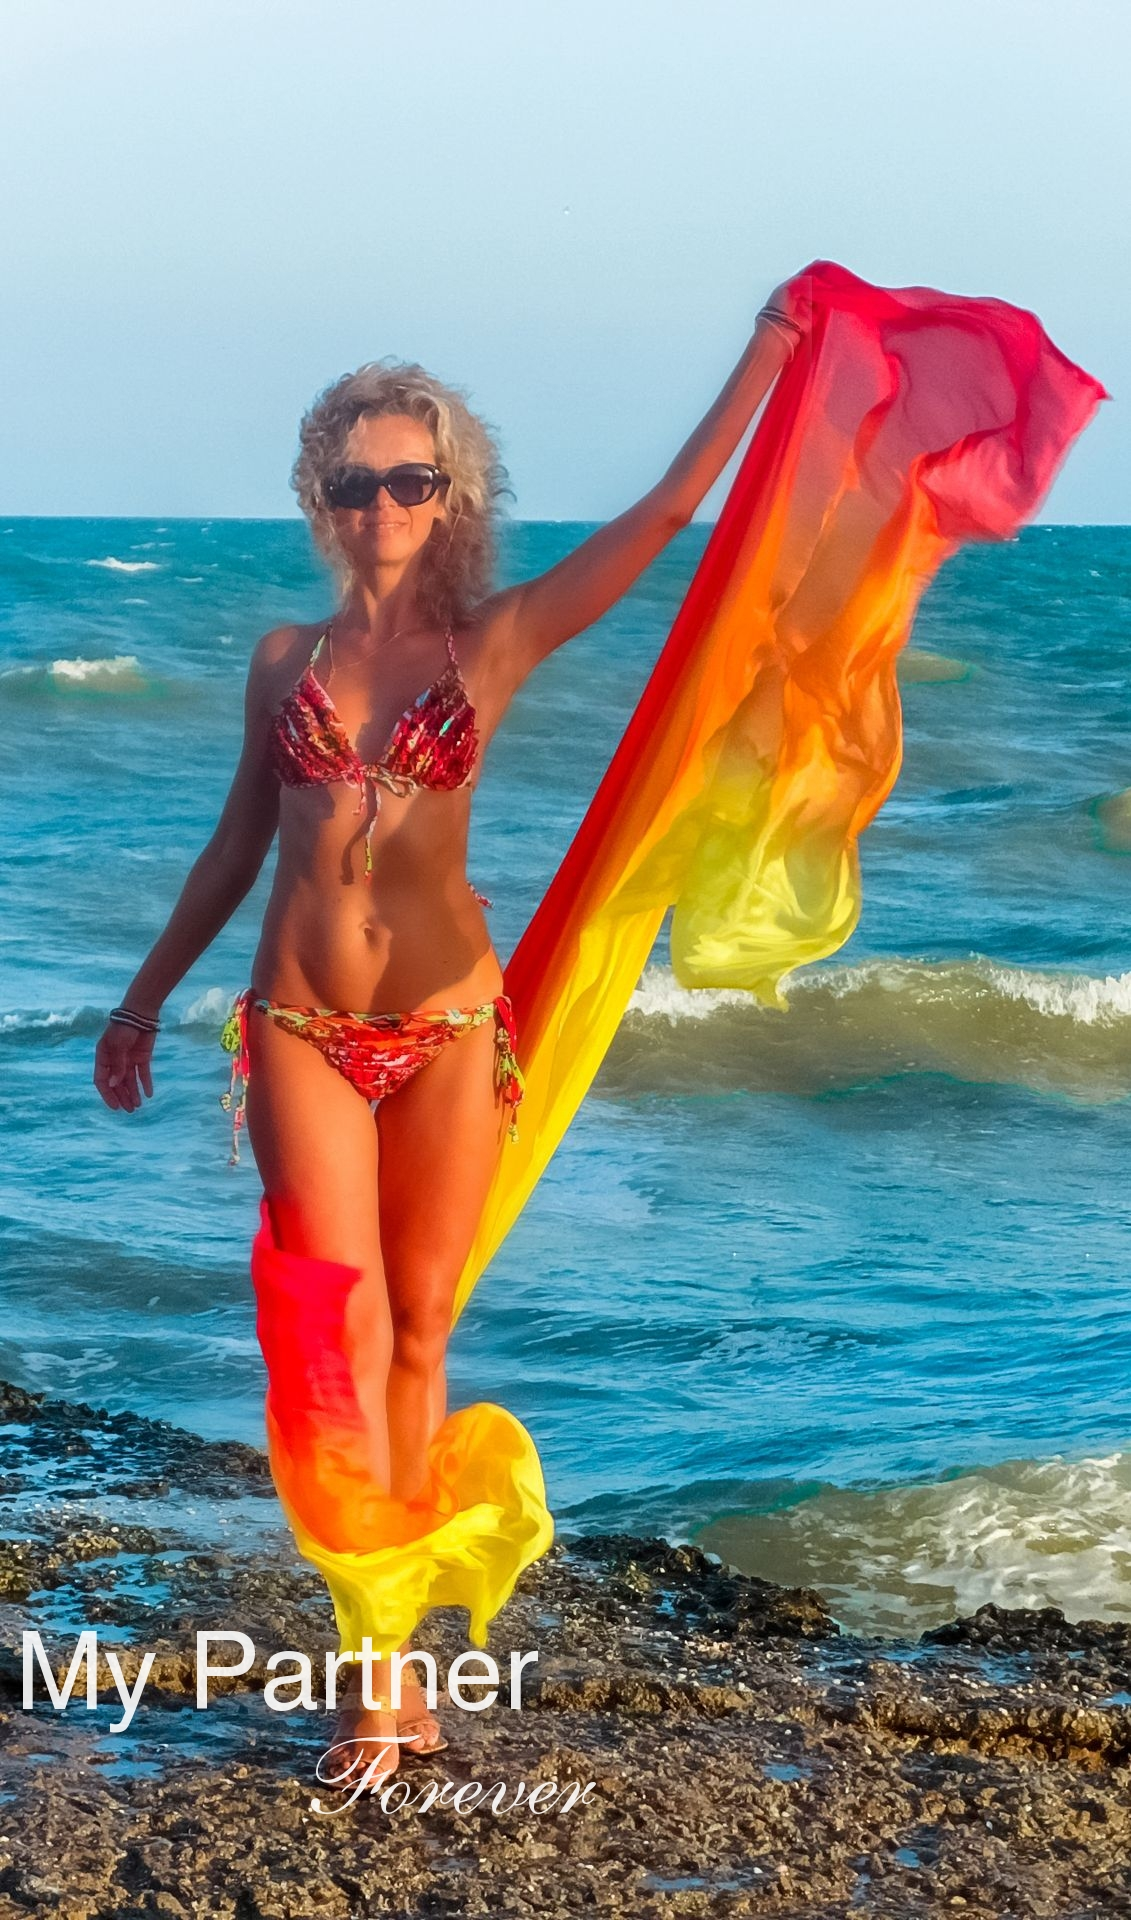 Meet Single Ukrainian Woman Tatiyana from Dniepropetrovsk, Ukraine